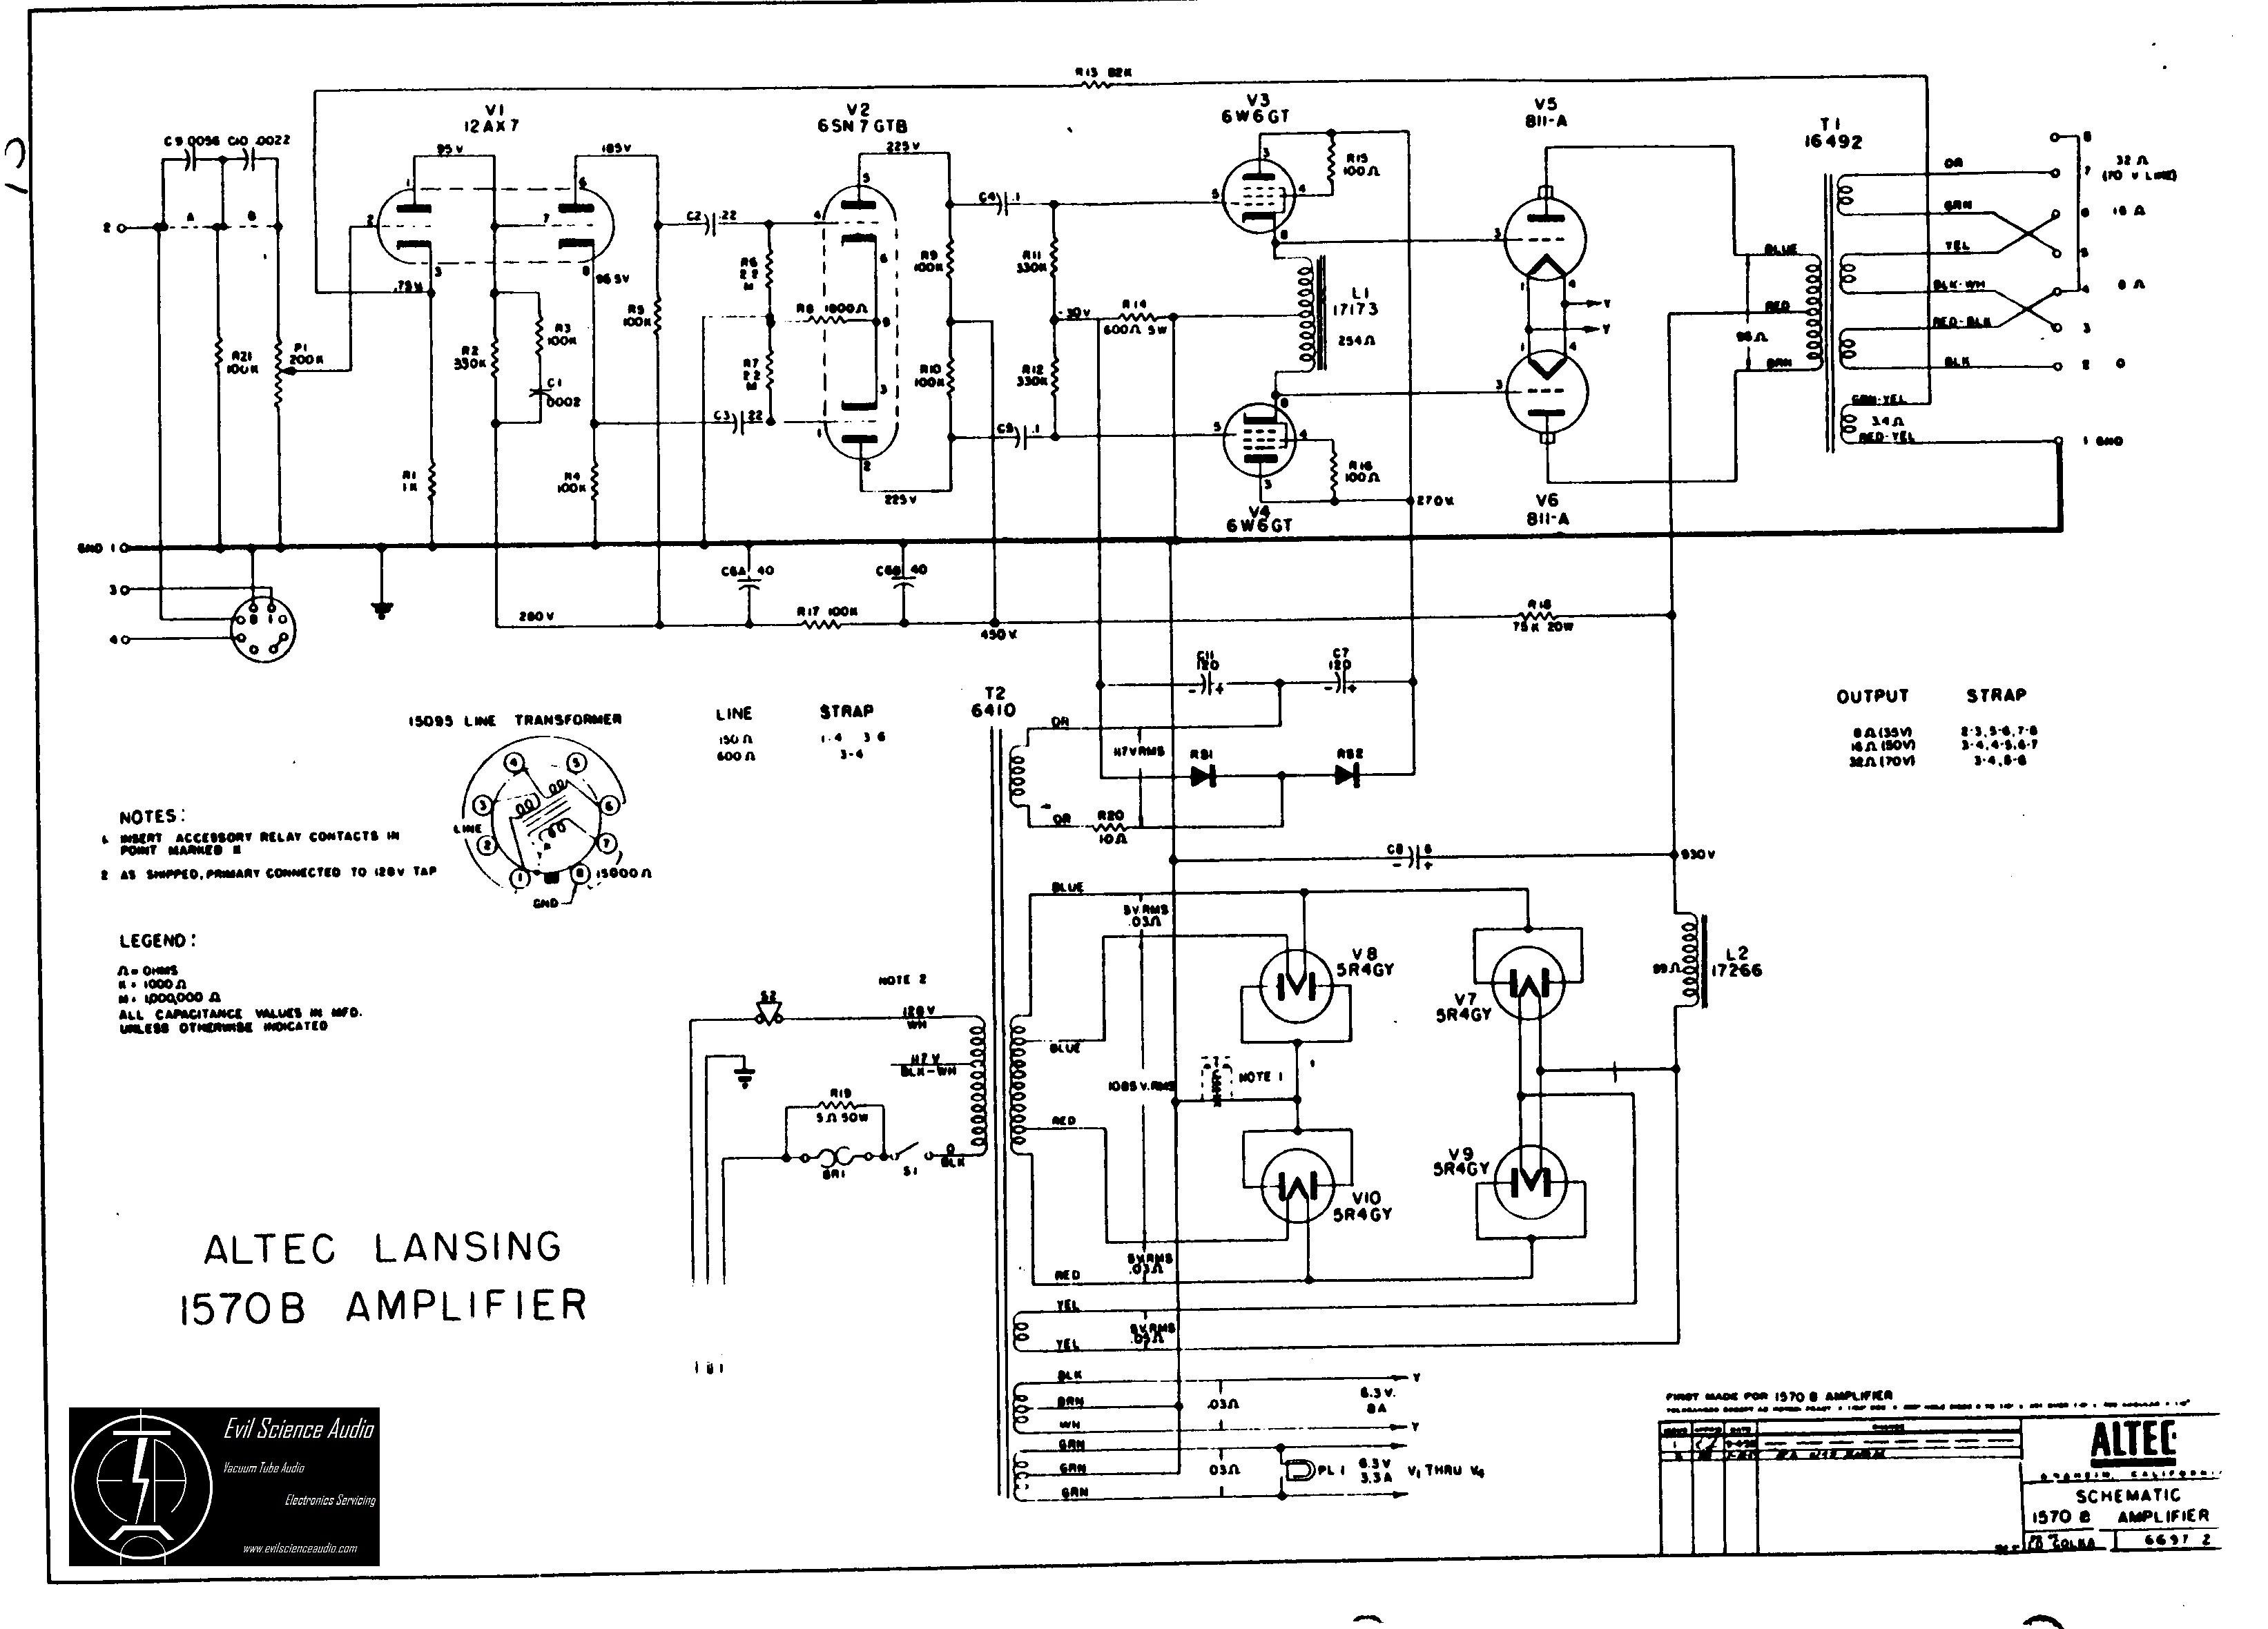 altec wiring diagram wiring block diagram Asus Wiring Diagram altec wiring diagram data wiring diagram schematic switch wiring diagram altec lansing gcs 100 wiring diagram